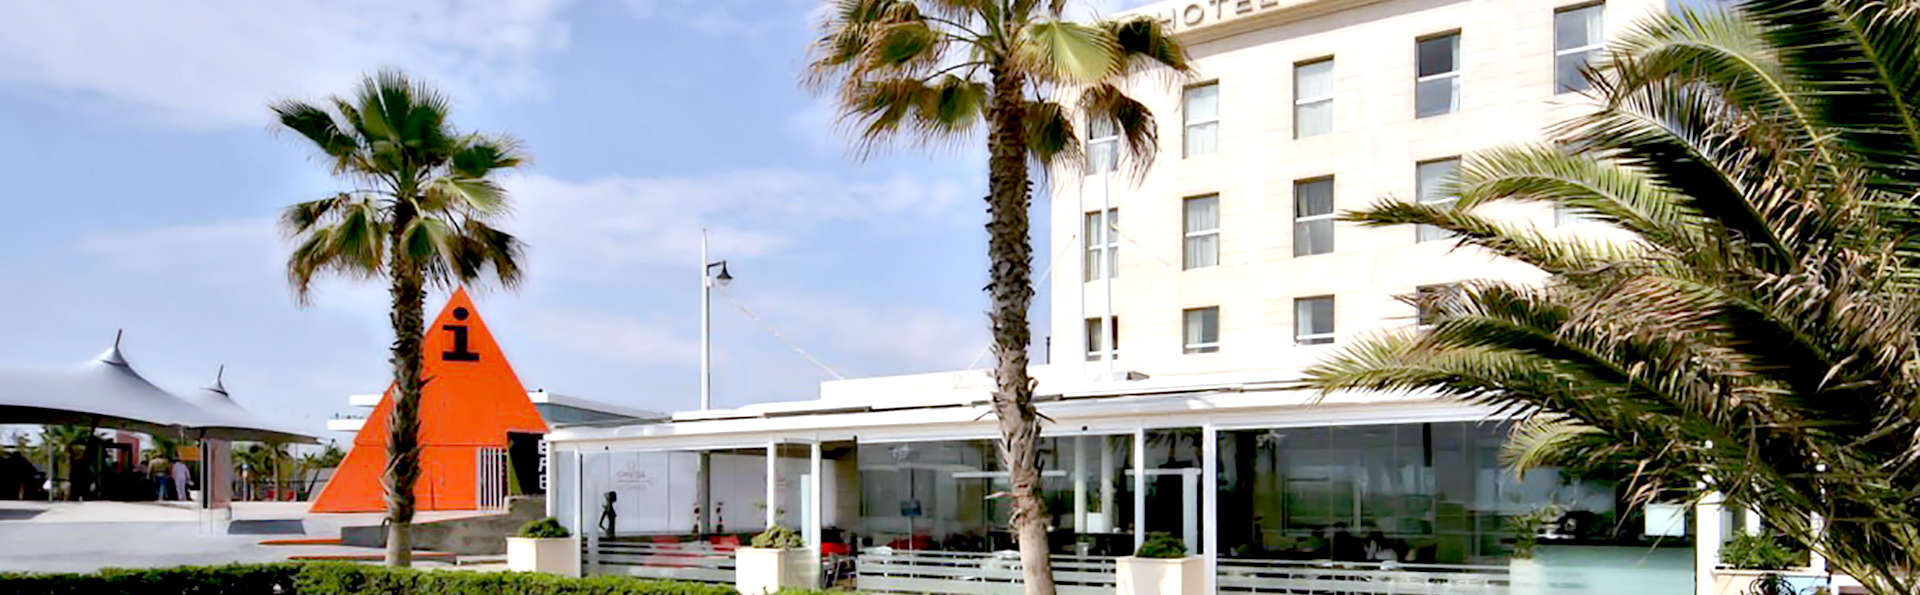 Hotel Neptuno Valencia - Edit_Frontc.jpg